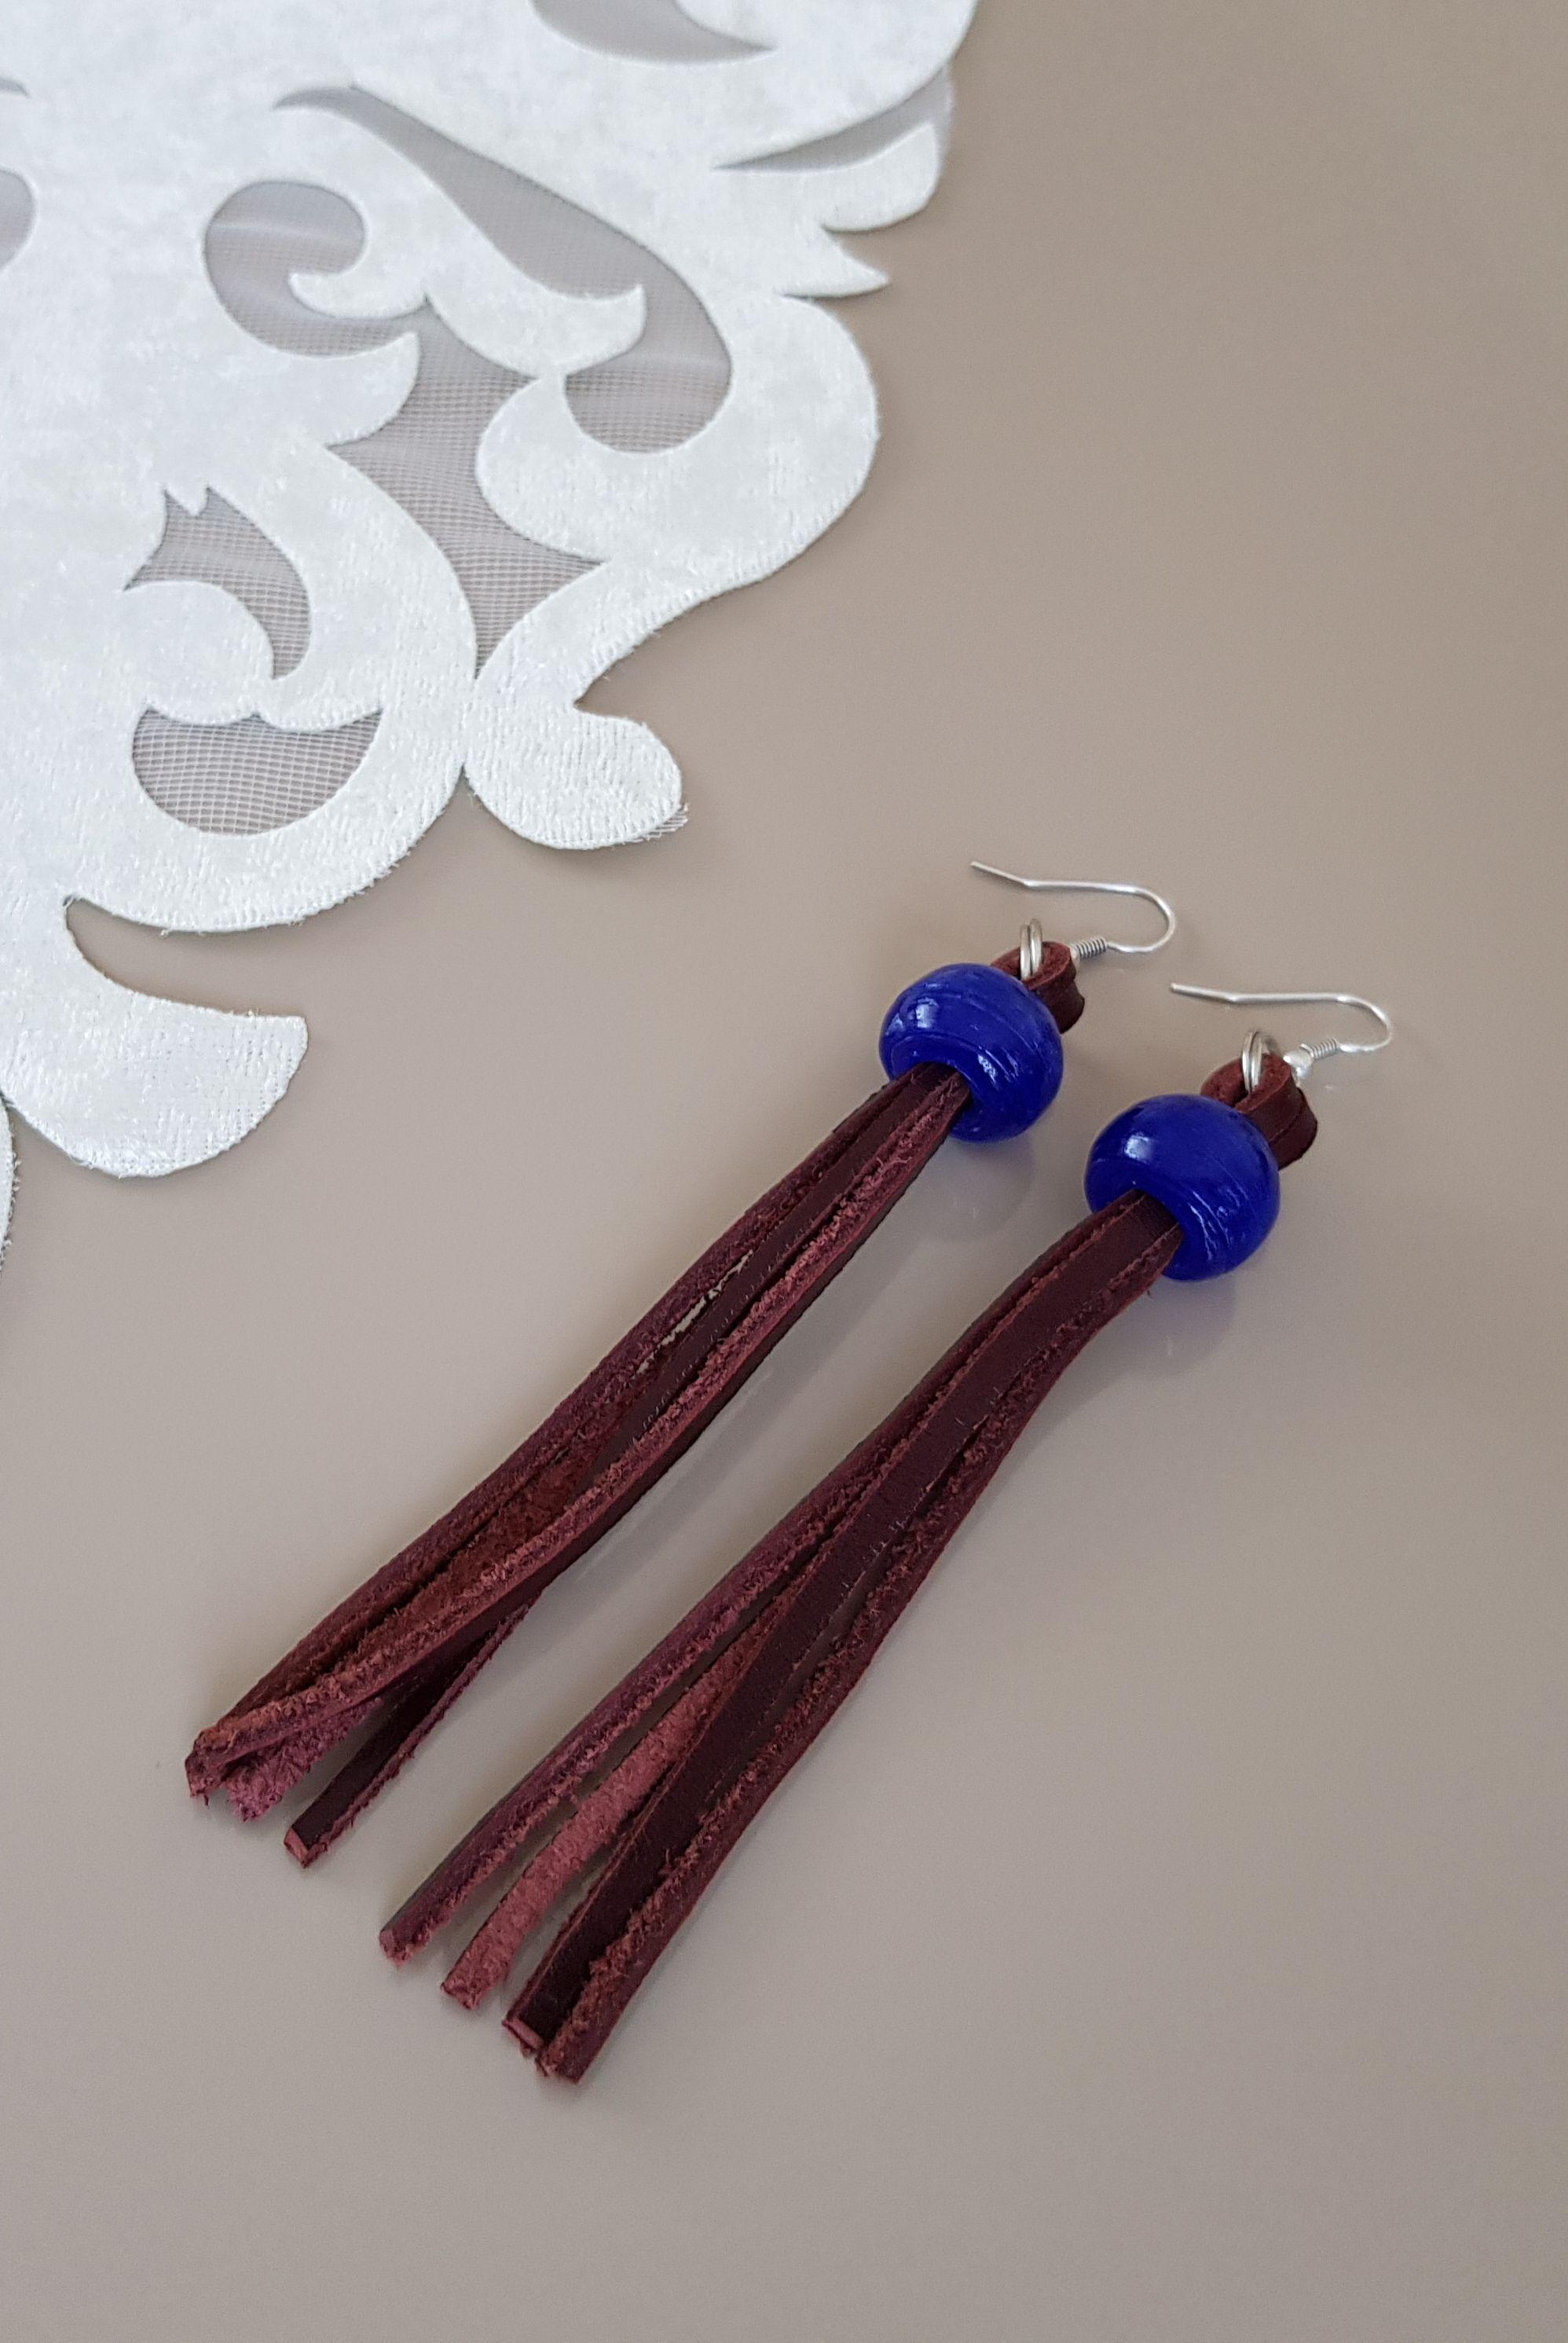 Fashion Bohemian Handcrafted Long Midnight Black Tassel Dangle Drop Earrings Perfect Gifts